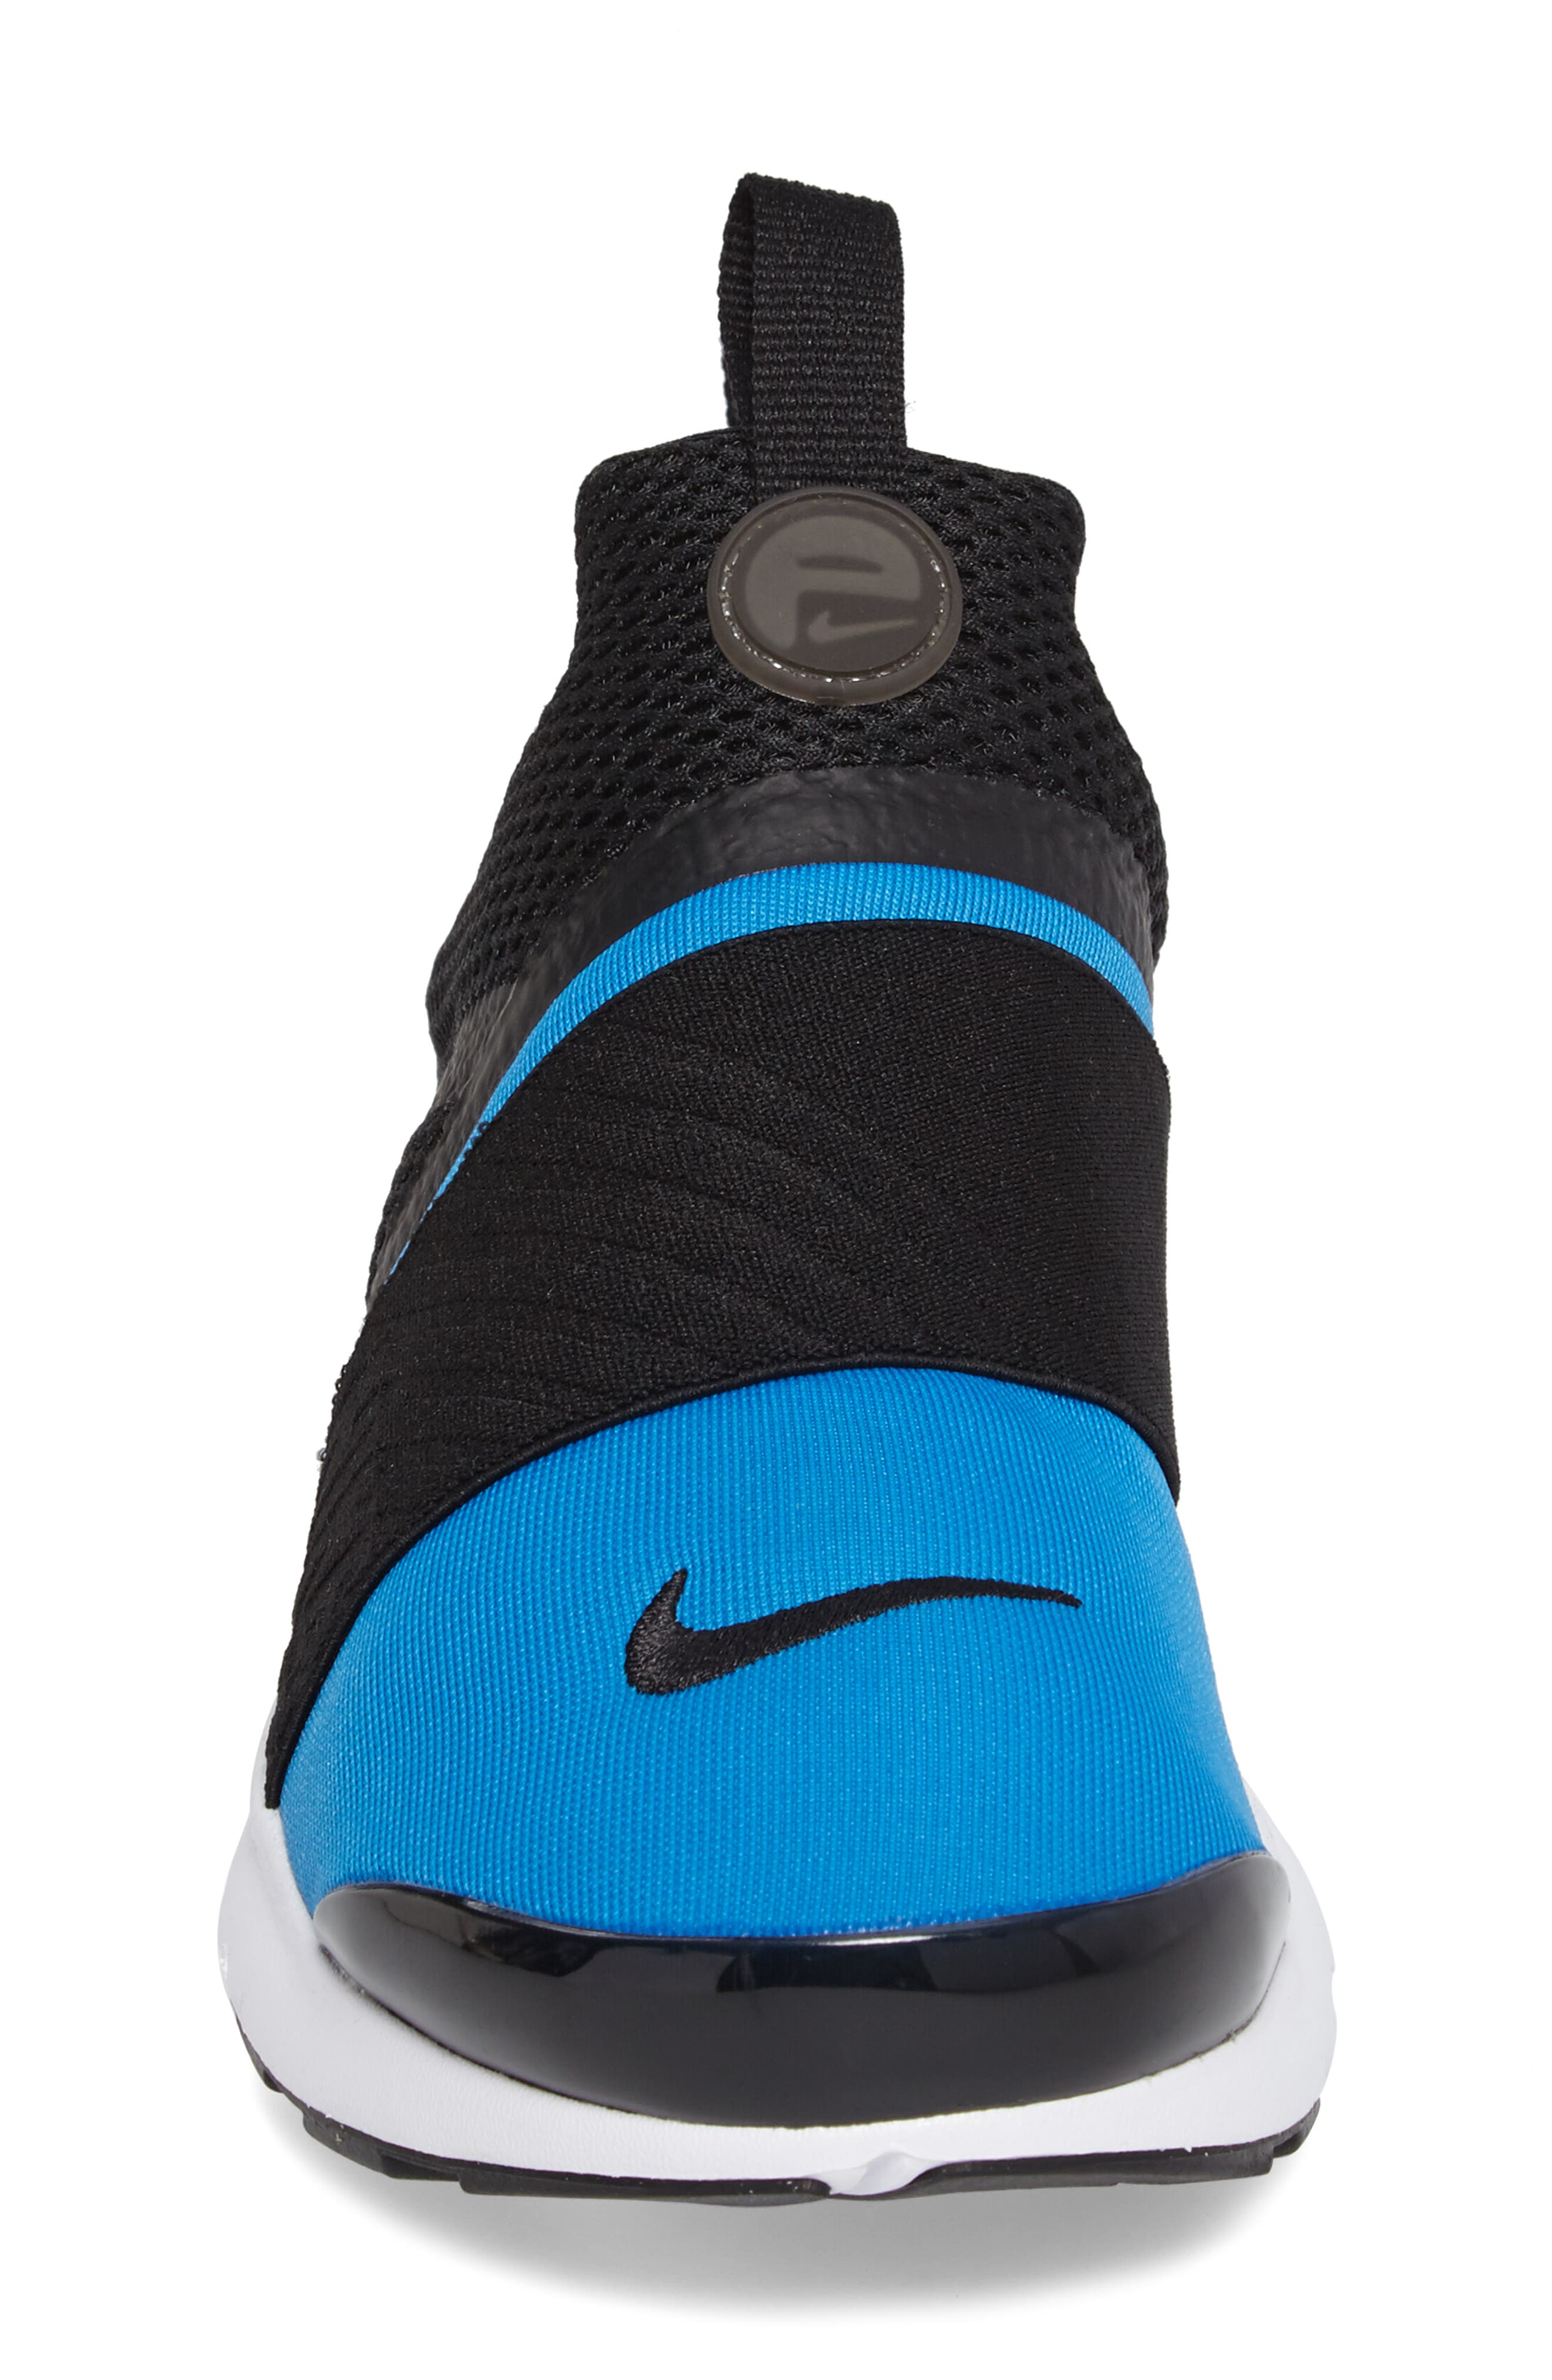 Presto Extreme Sneaker,                             Alternate thumbnail 43, color,